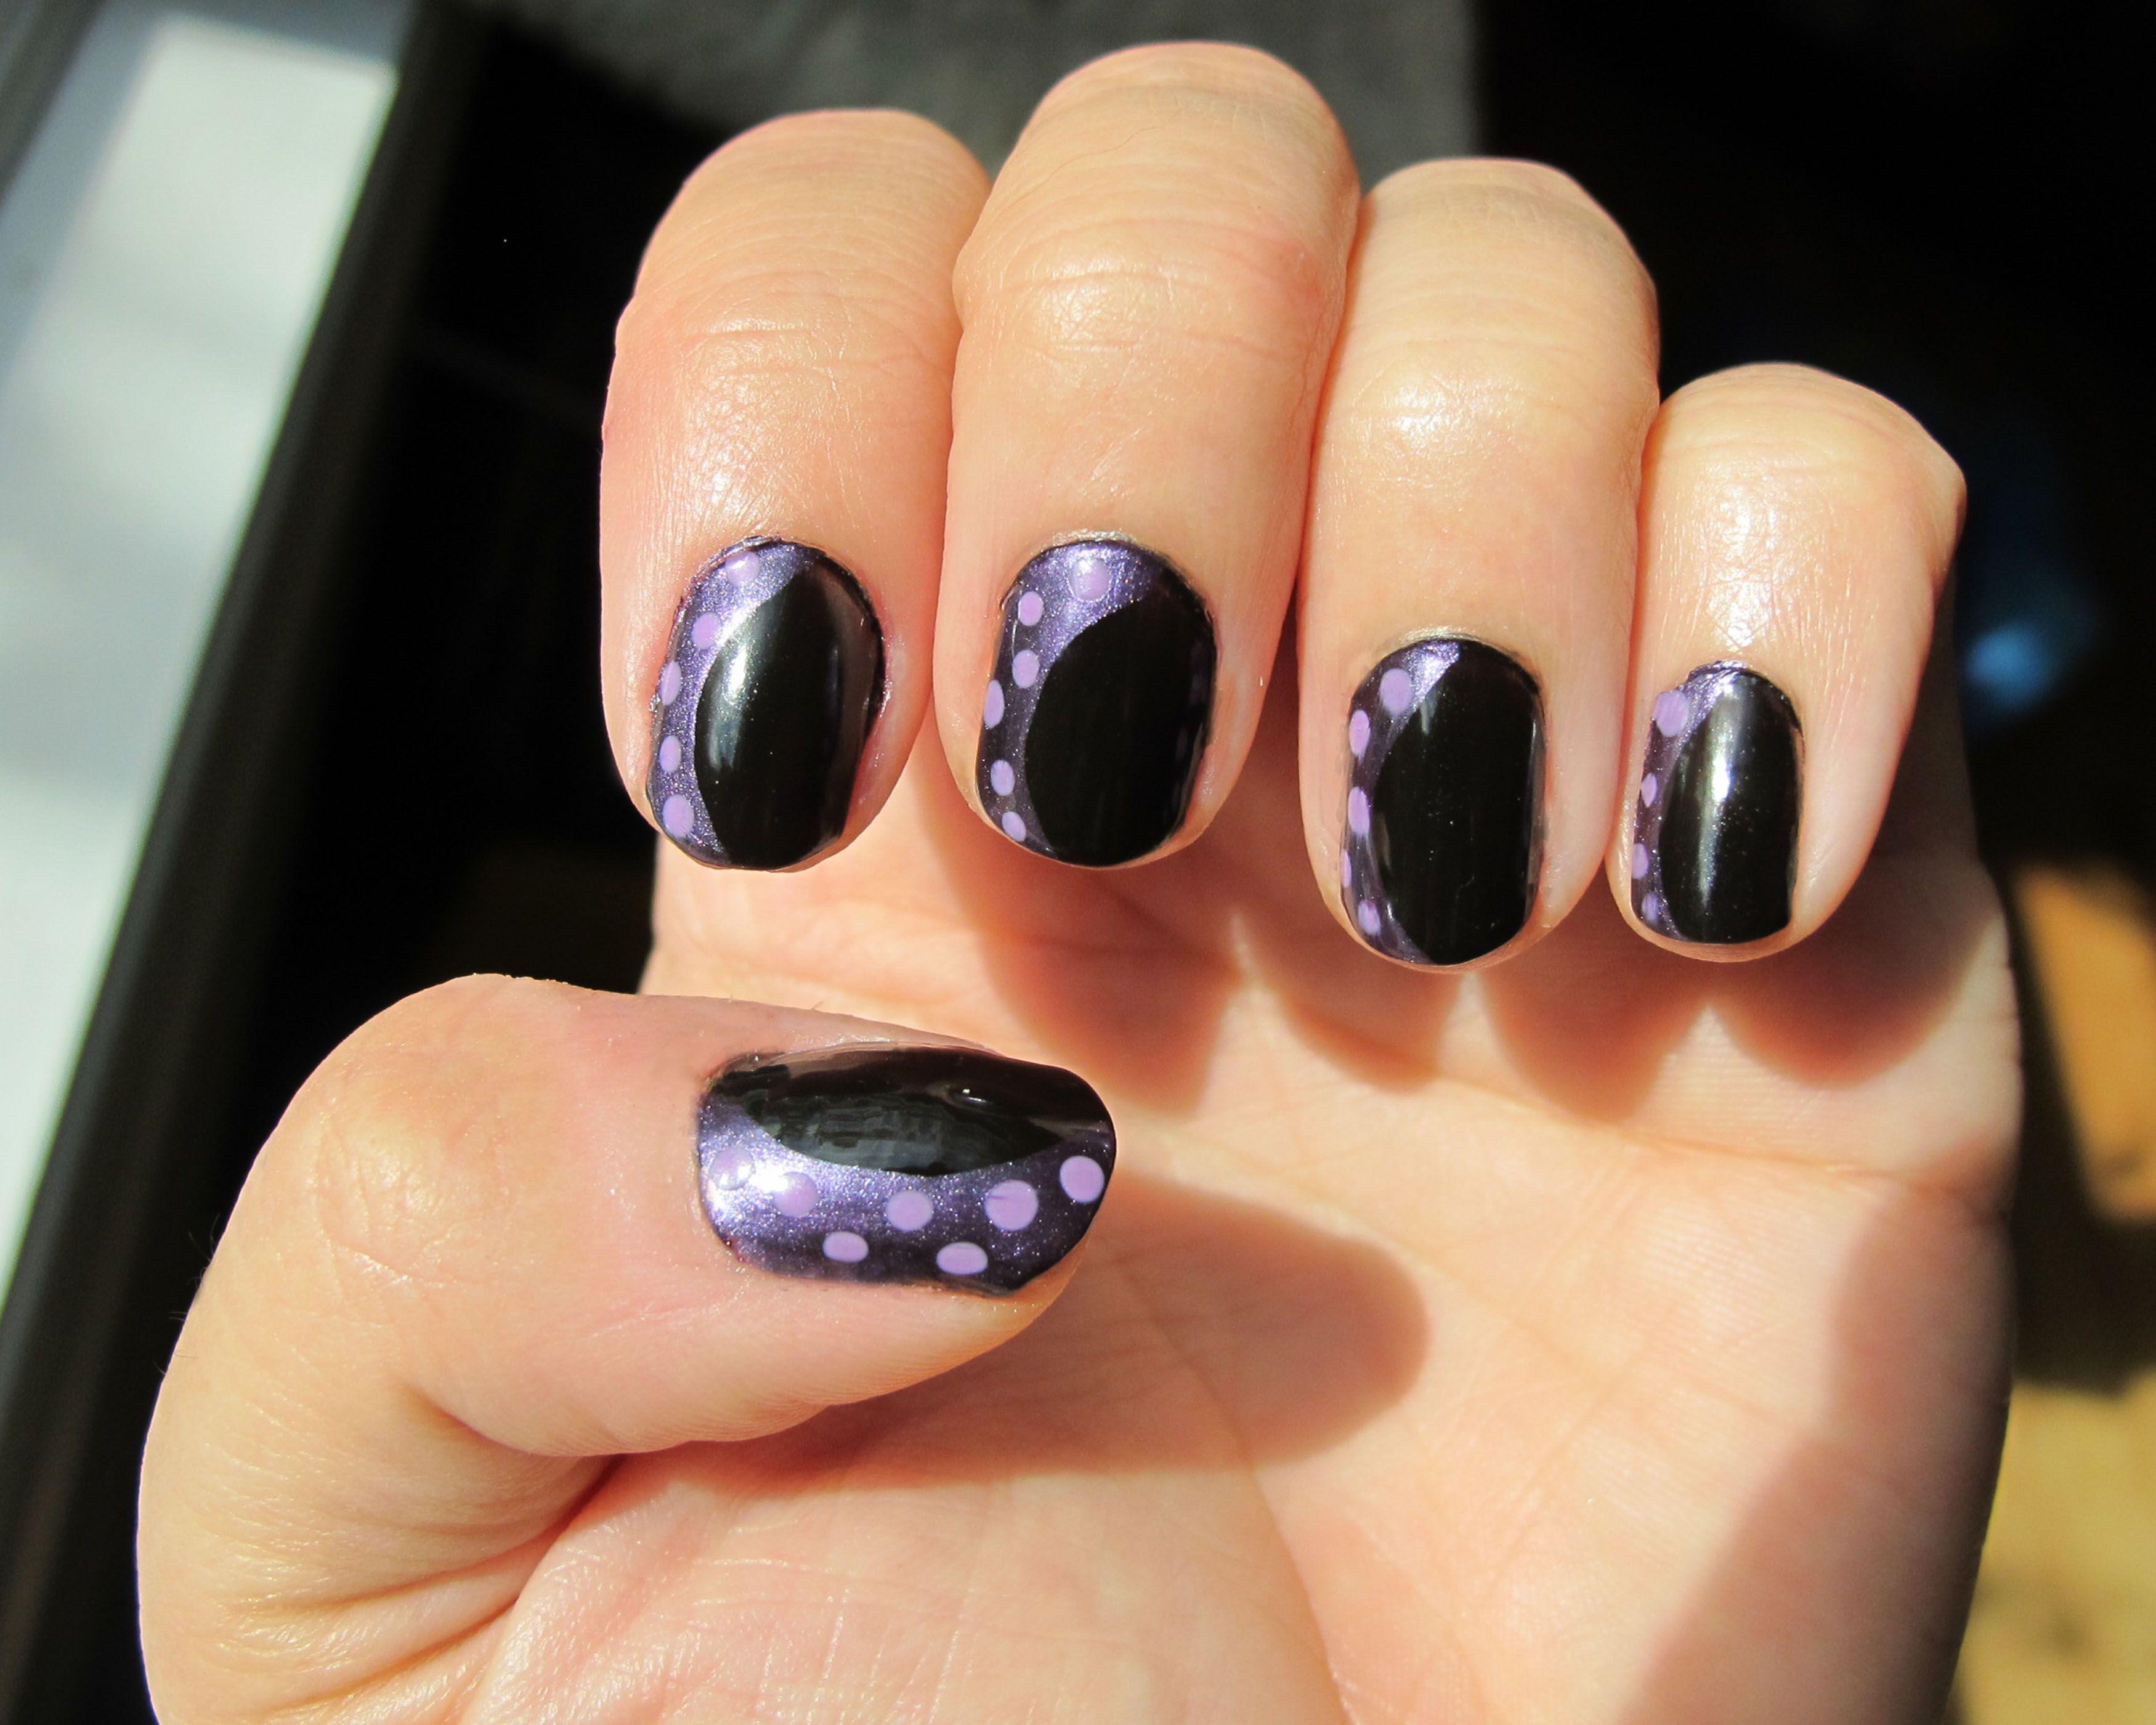 maleficent and ursula acrylic nails photo - 1